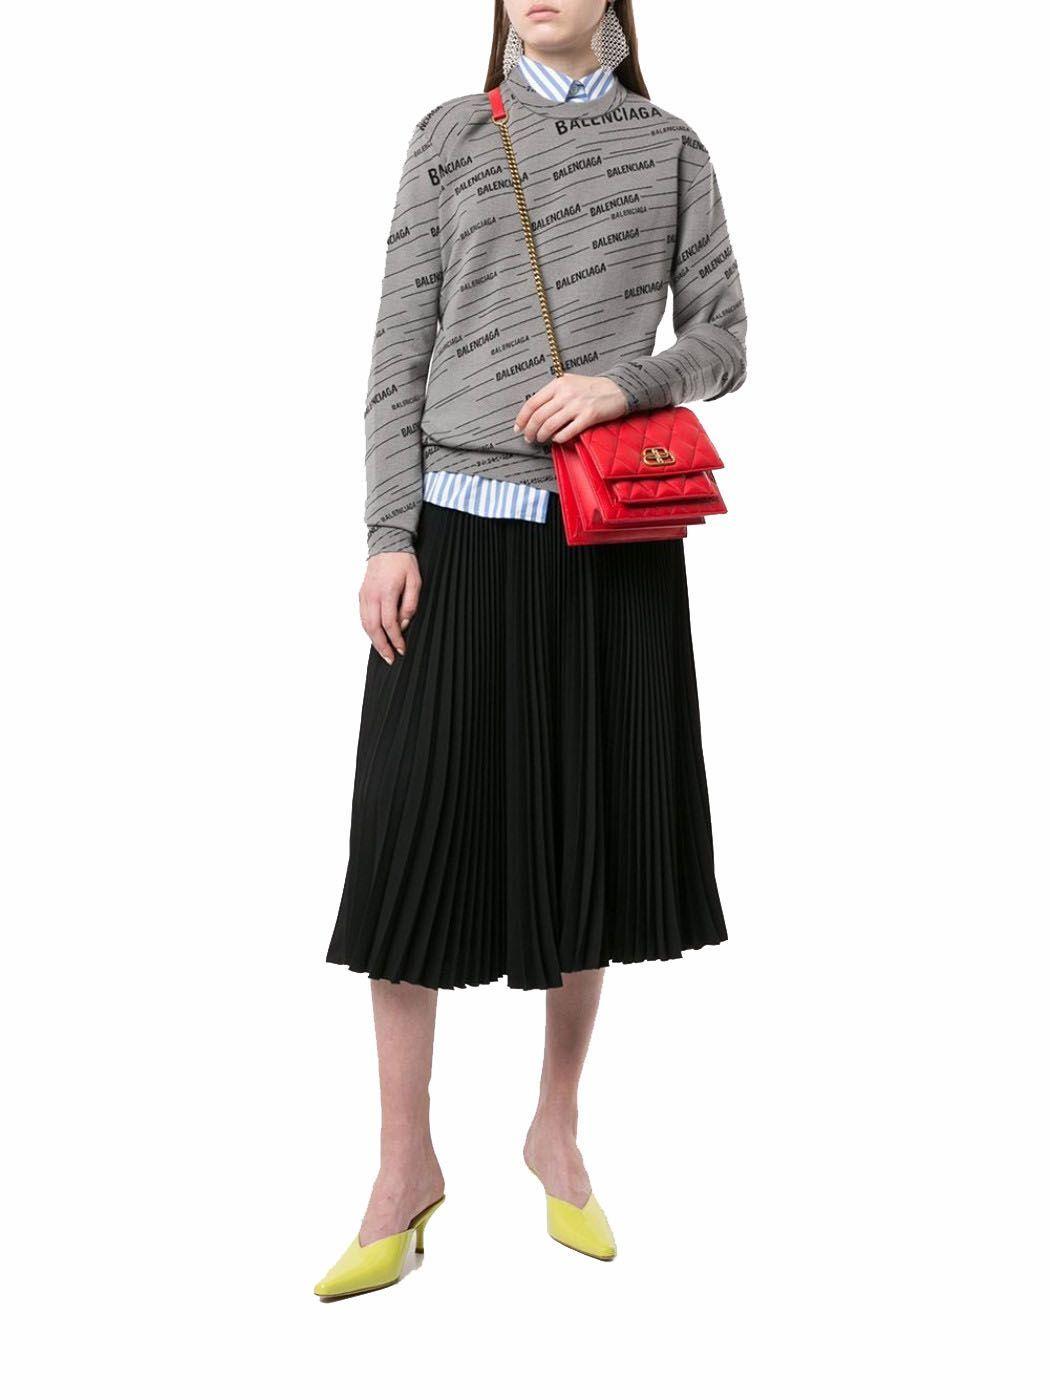 BALENCIAGA WOMEN'S 5806411NH3M6406 RED LEATHER SHOULDER BAG